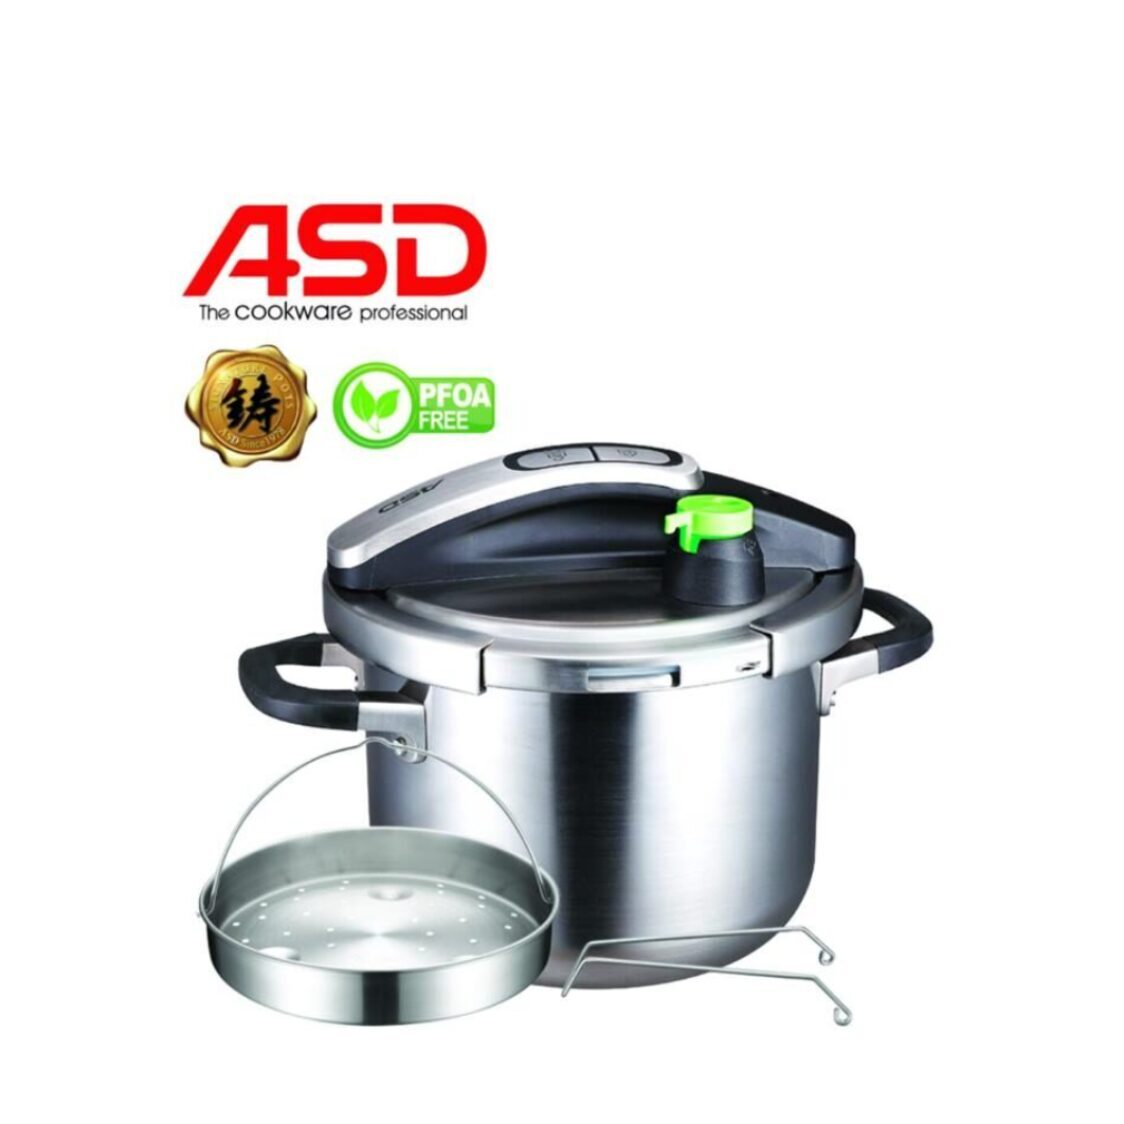 ASD 6L 3-Ply Ultra Fast Pressure Cooker HP6002PC